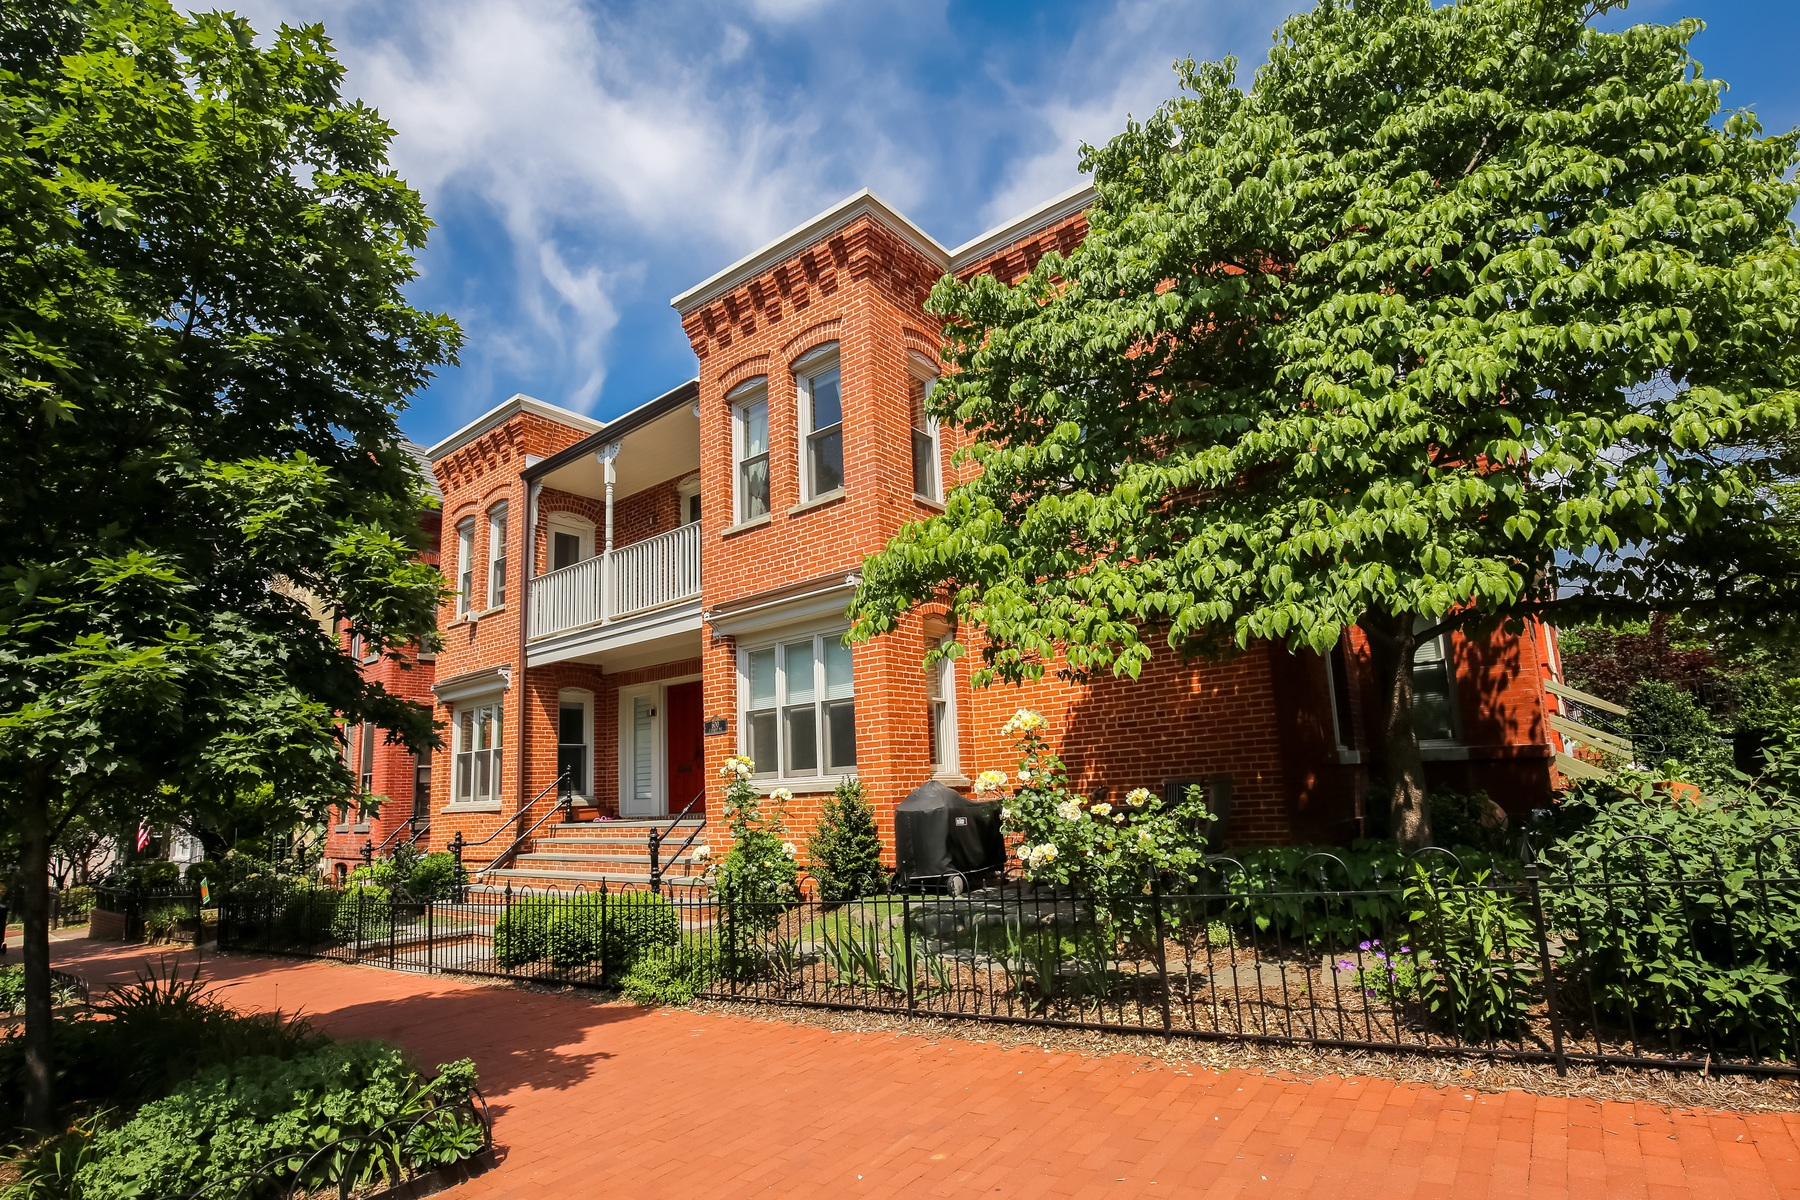 sales property at 600 E Street Ne, Washington